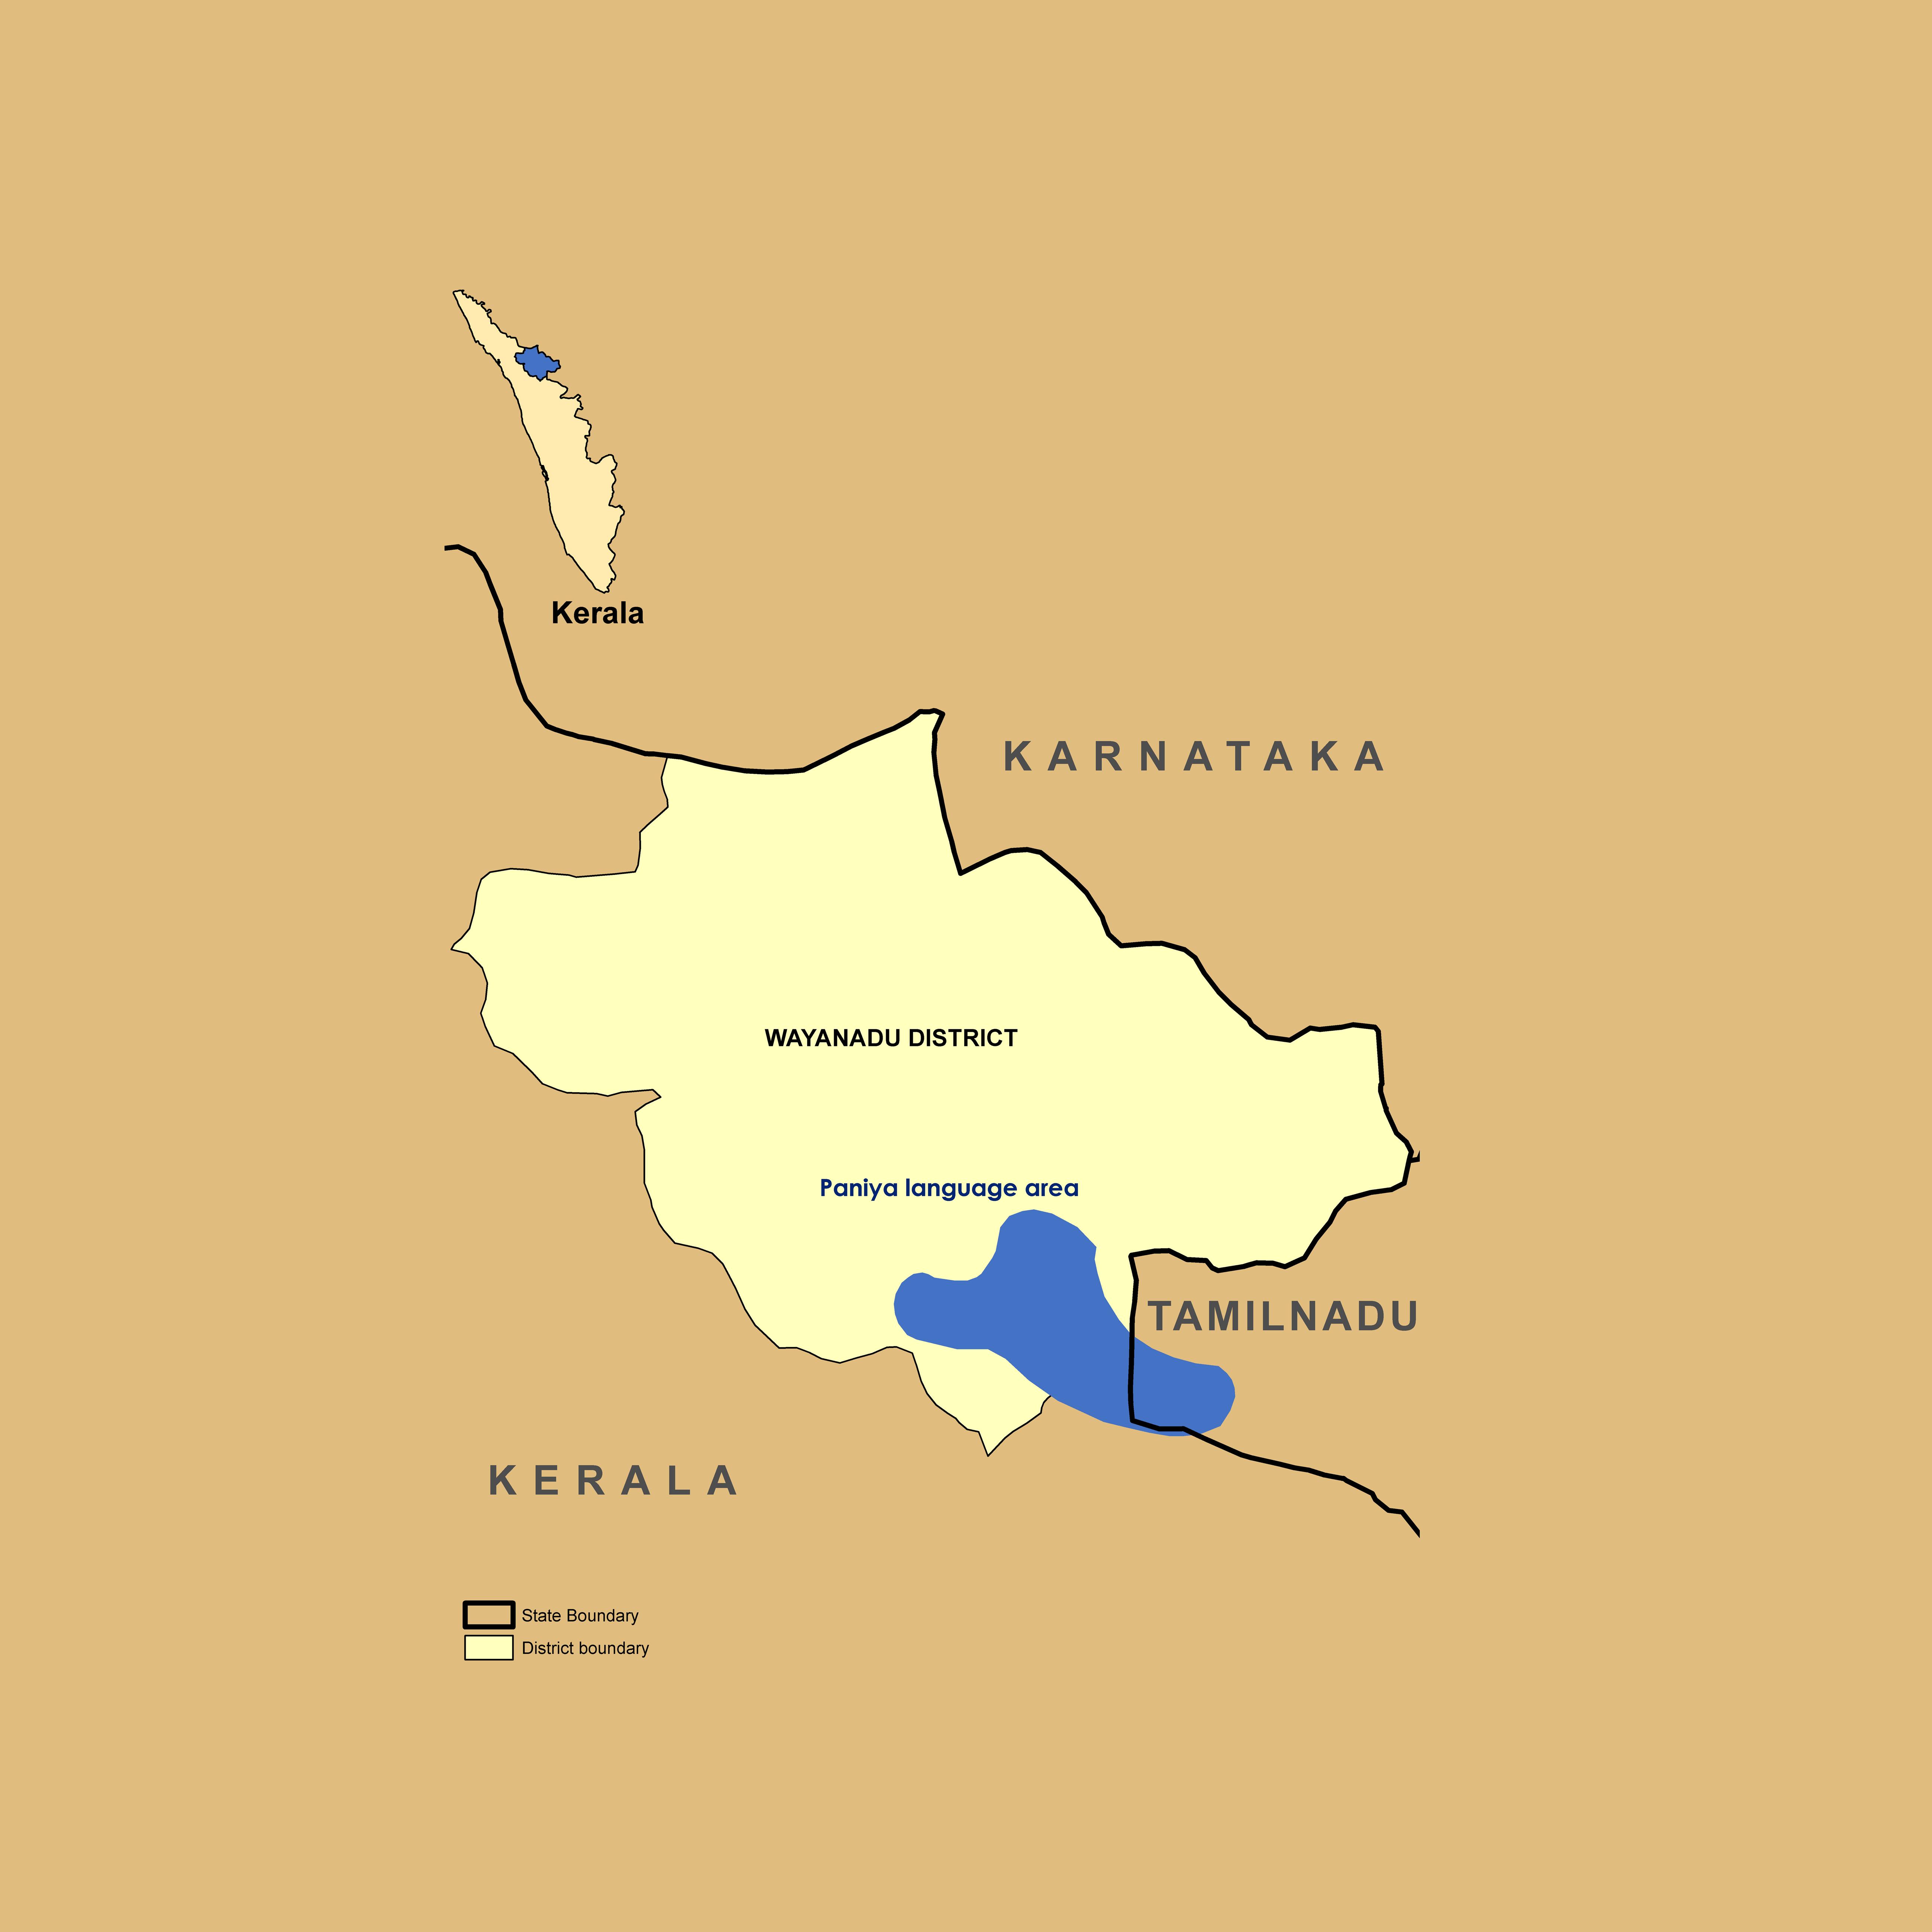 Paniya Regions